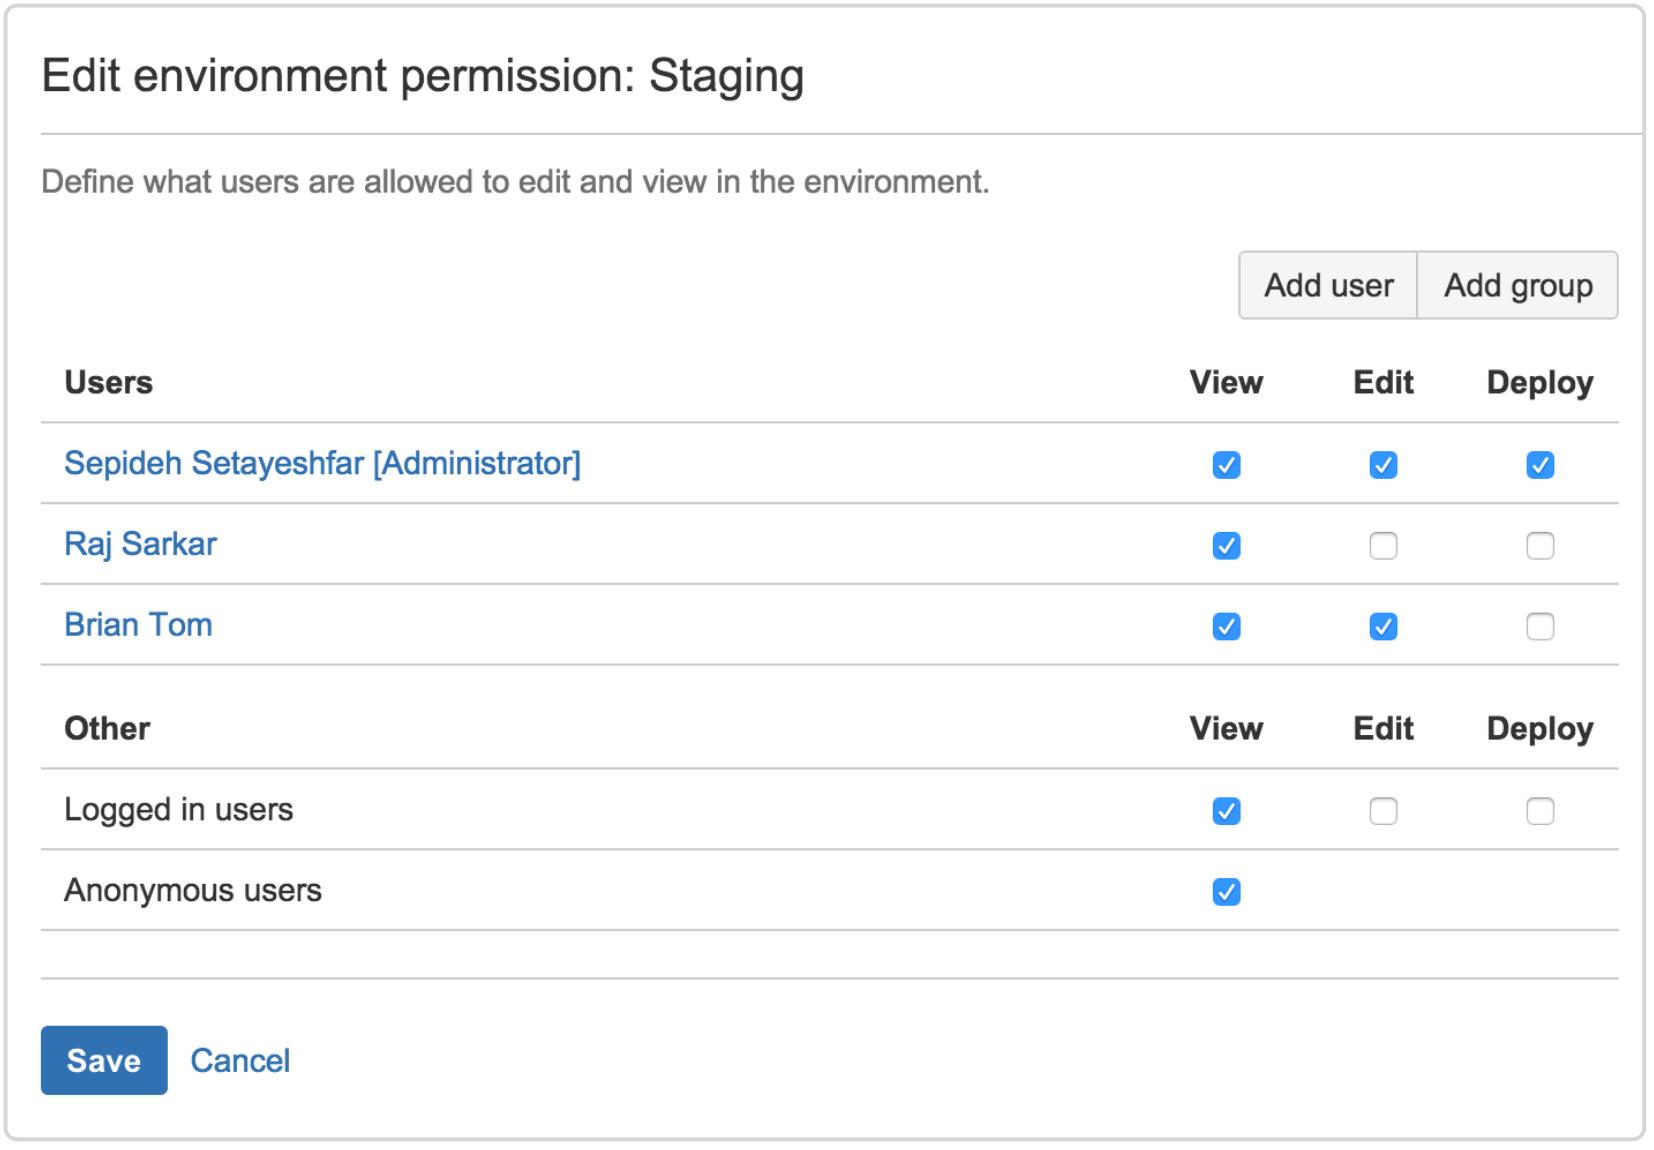 Edit environment permission: staging screenshot